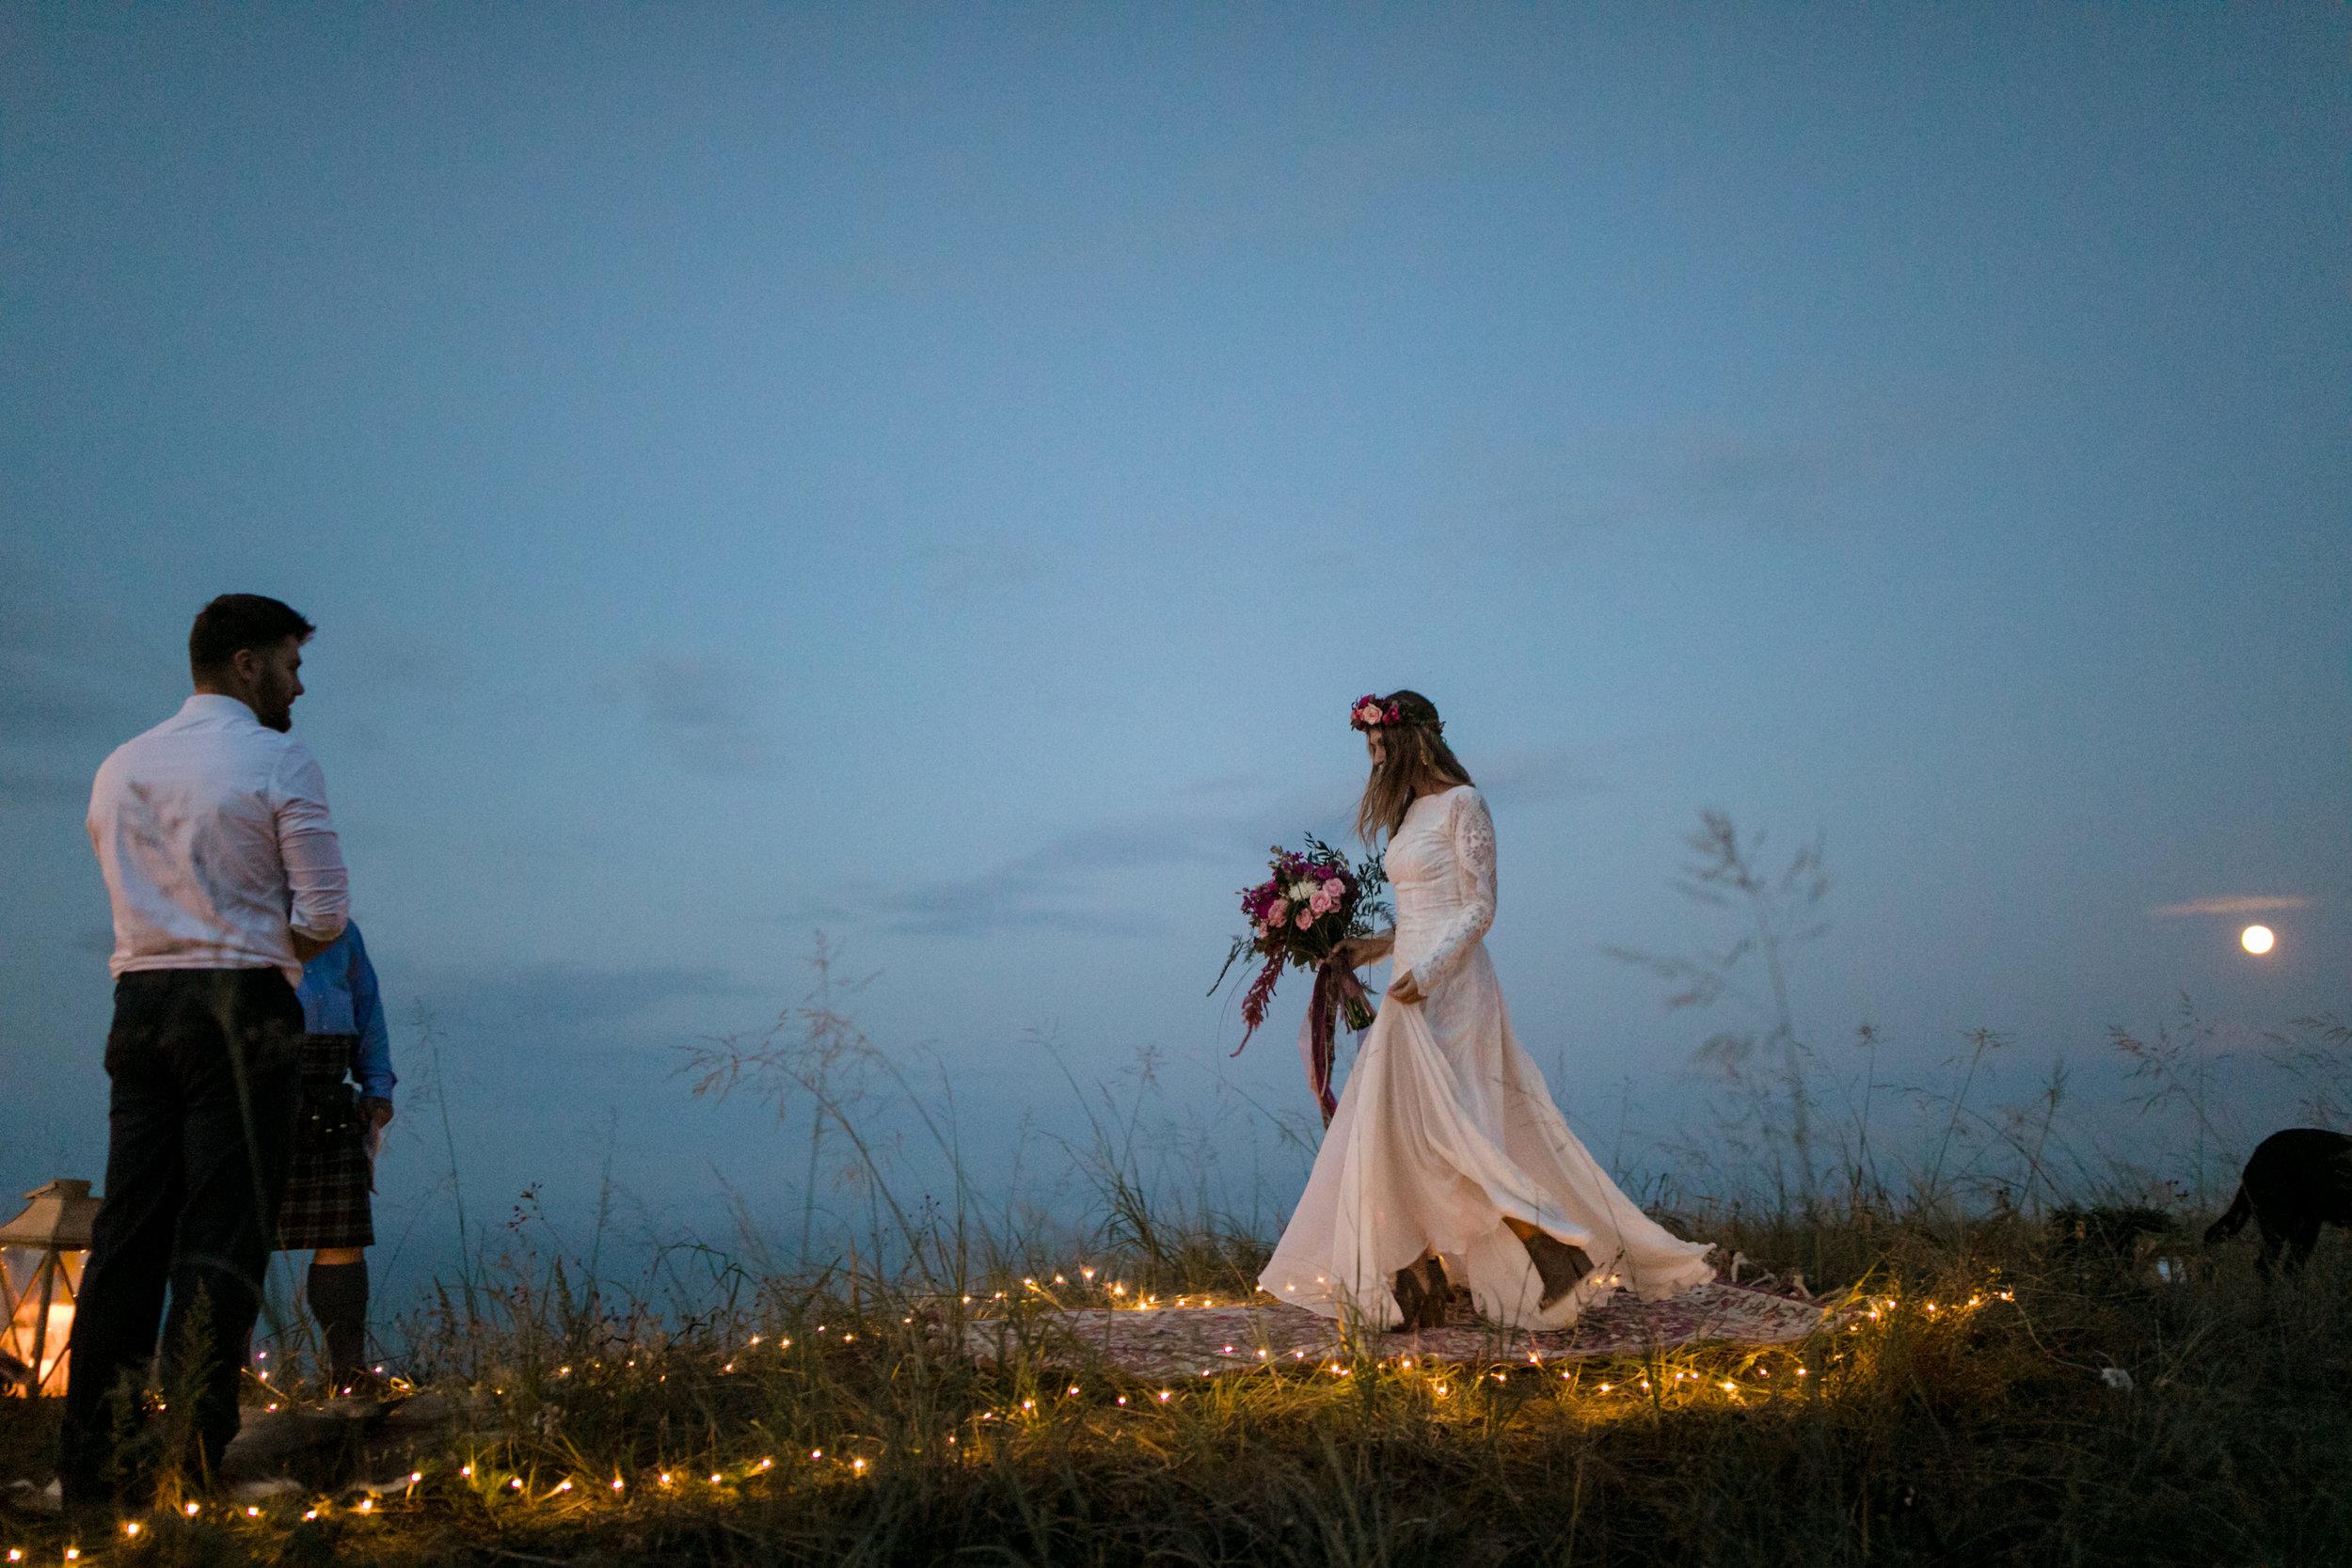 michigan-emotive-photographer-moonlight-elopement-mariha-hunter-254.jpg